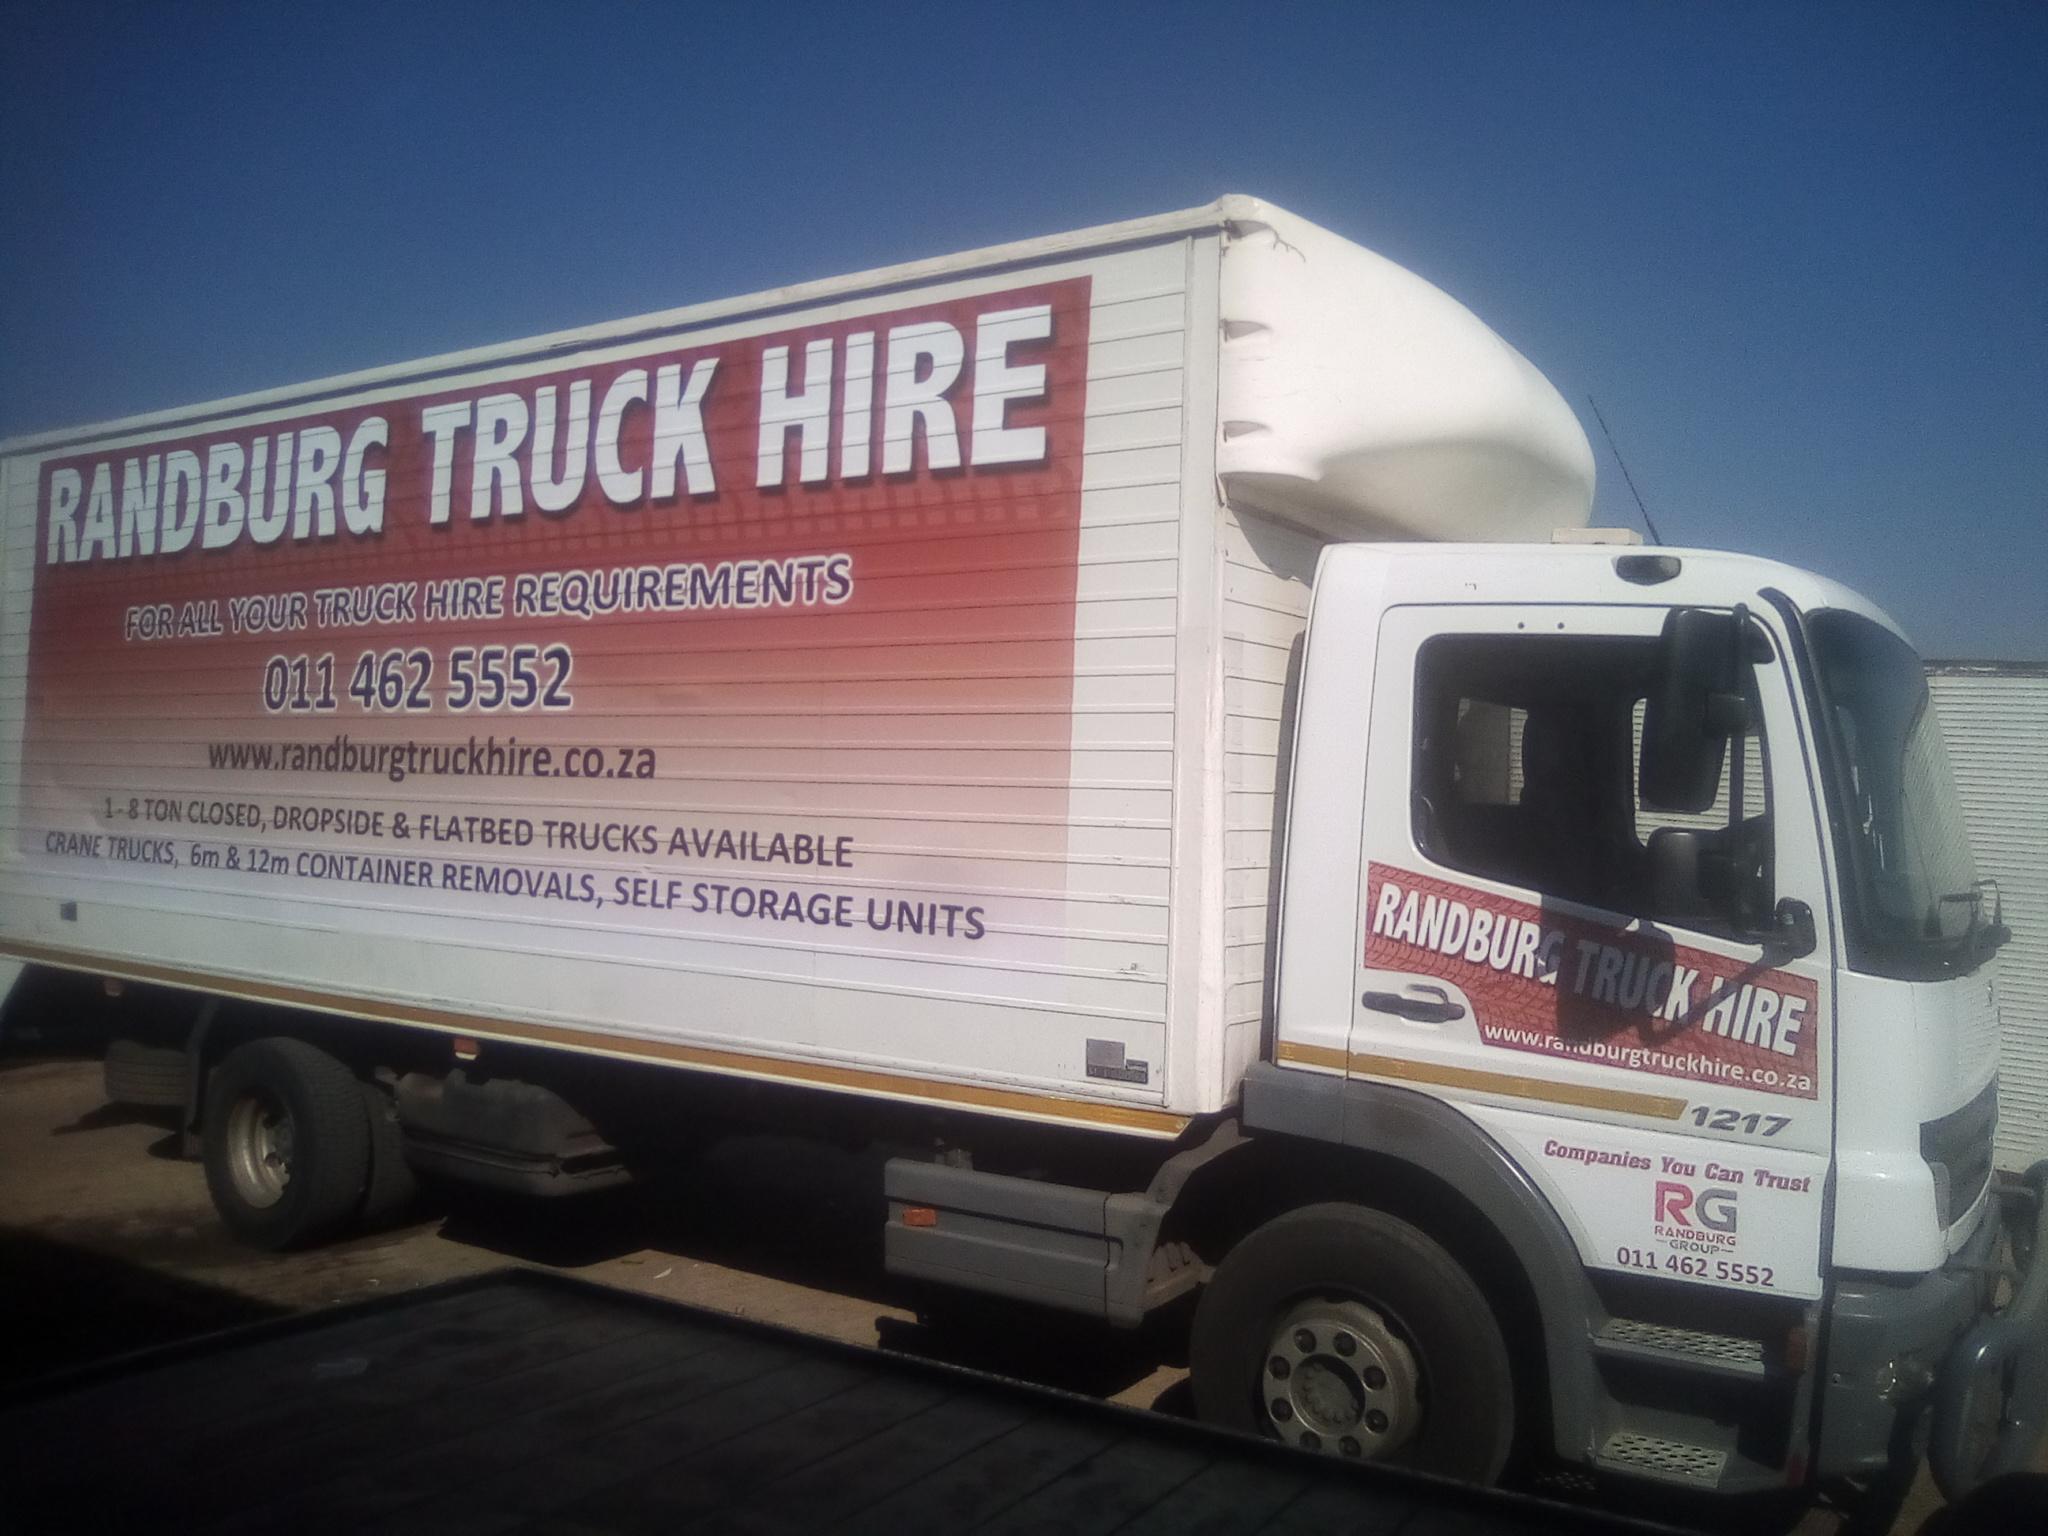 IMG_20180803_141551 Randburg Truck Hire